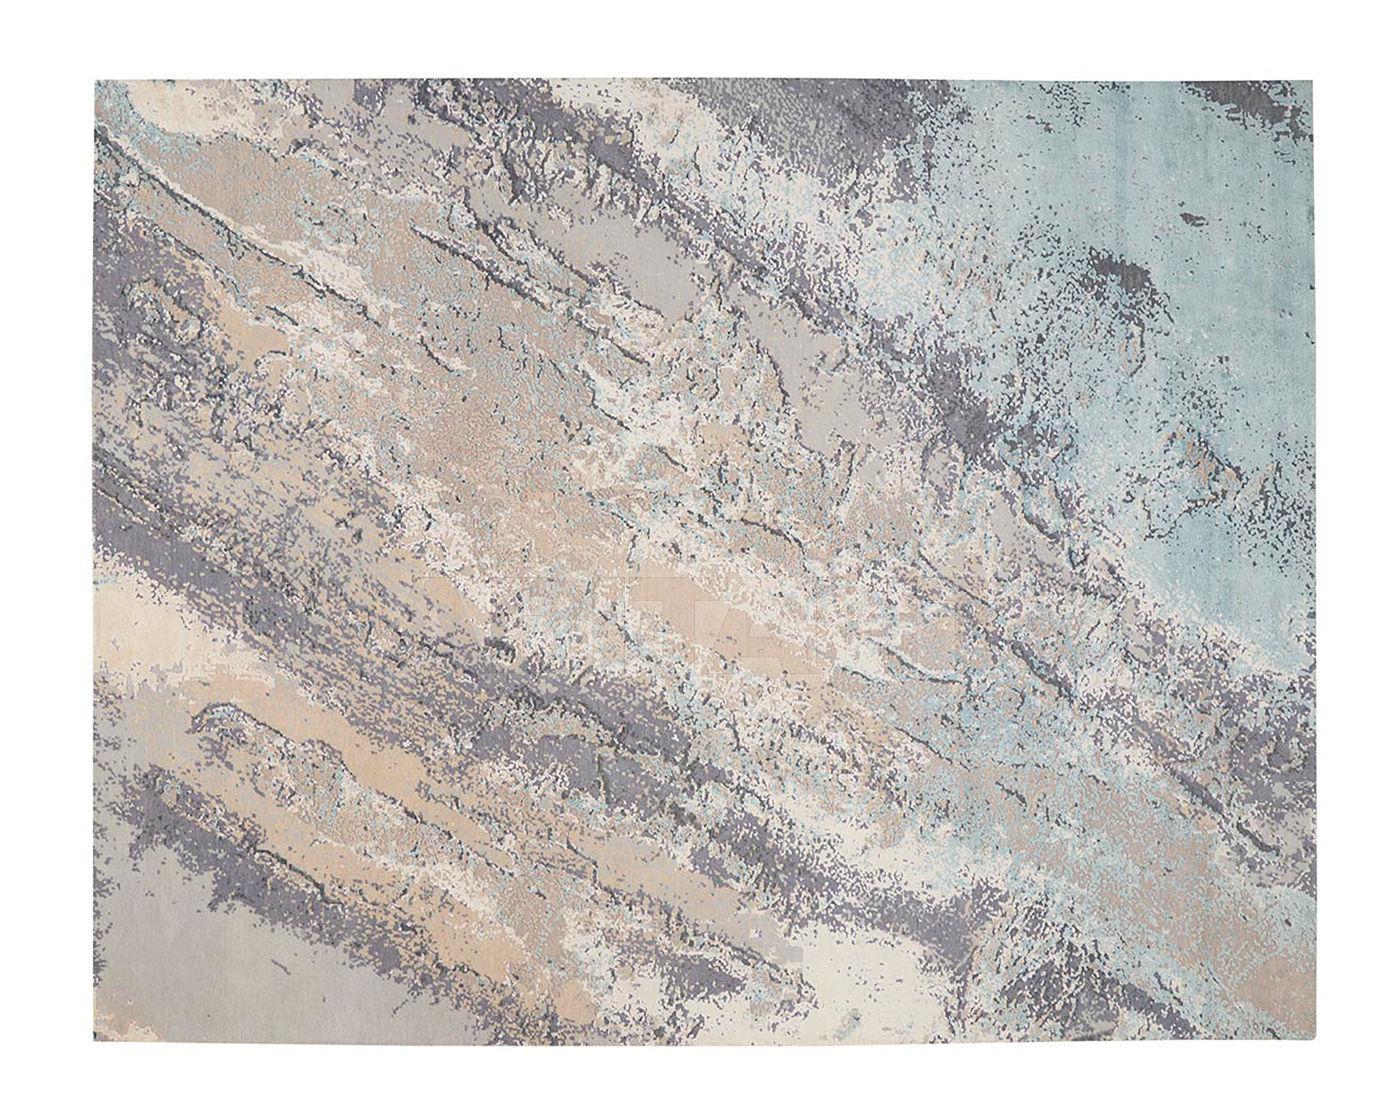 Купить Ковер современный GRANITA Christopher Guy 2019 47-0057-A-BIRCH/CHIC GREY